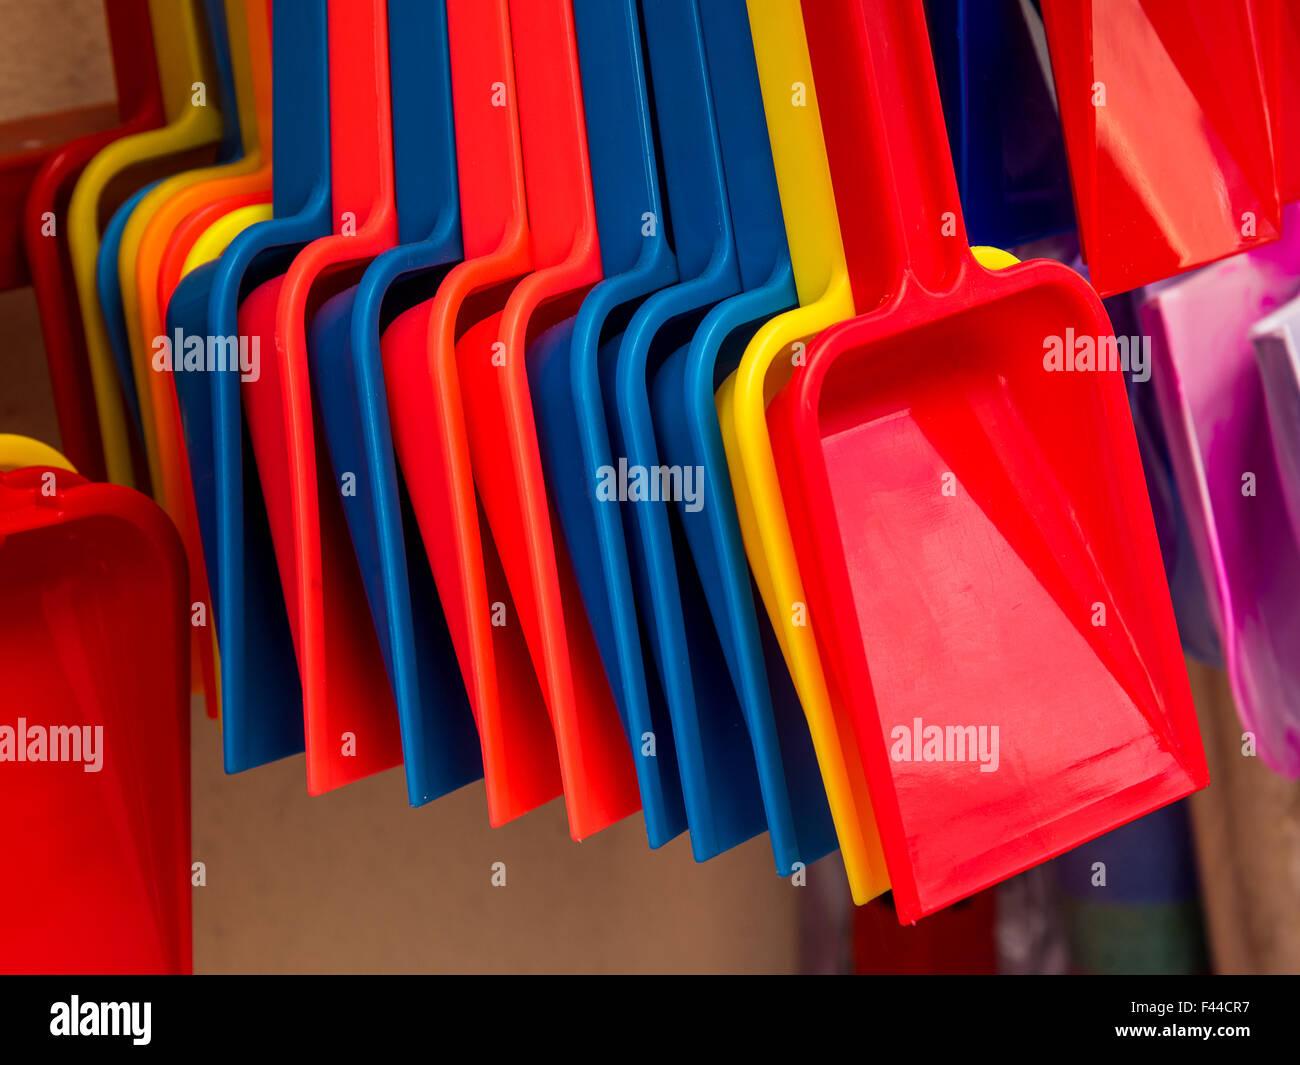 Multicoloured children's spades outside a seaside shop - Stock Image